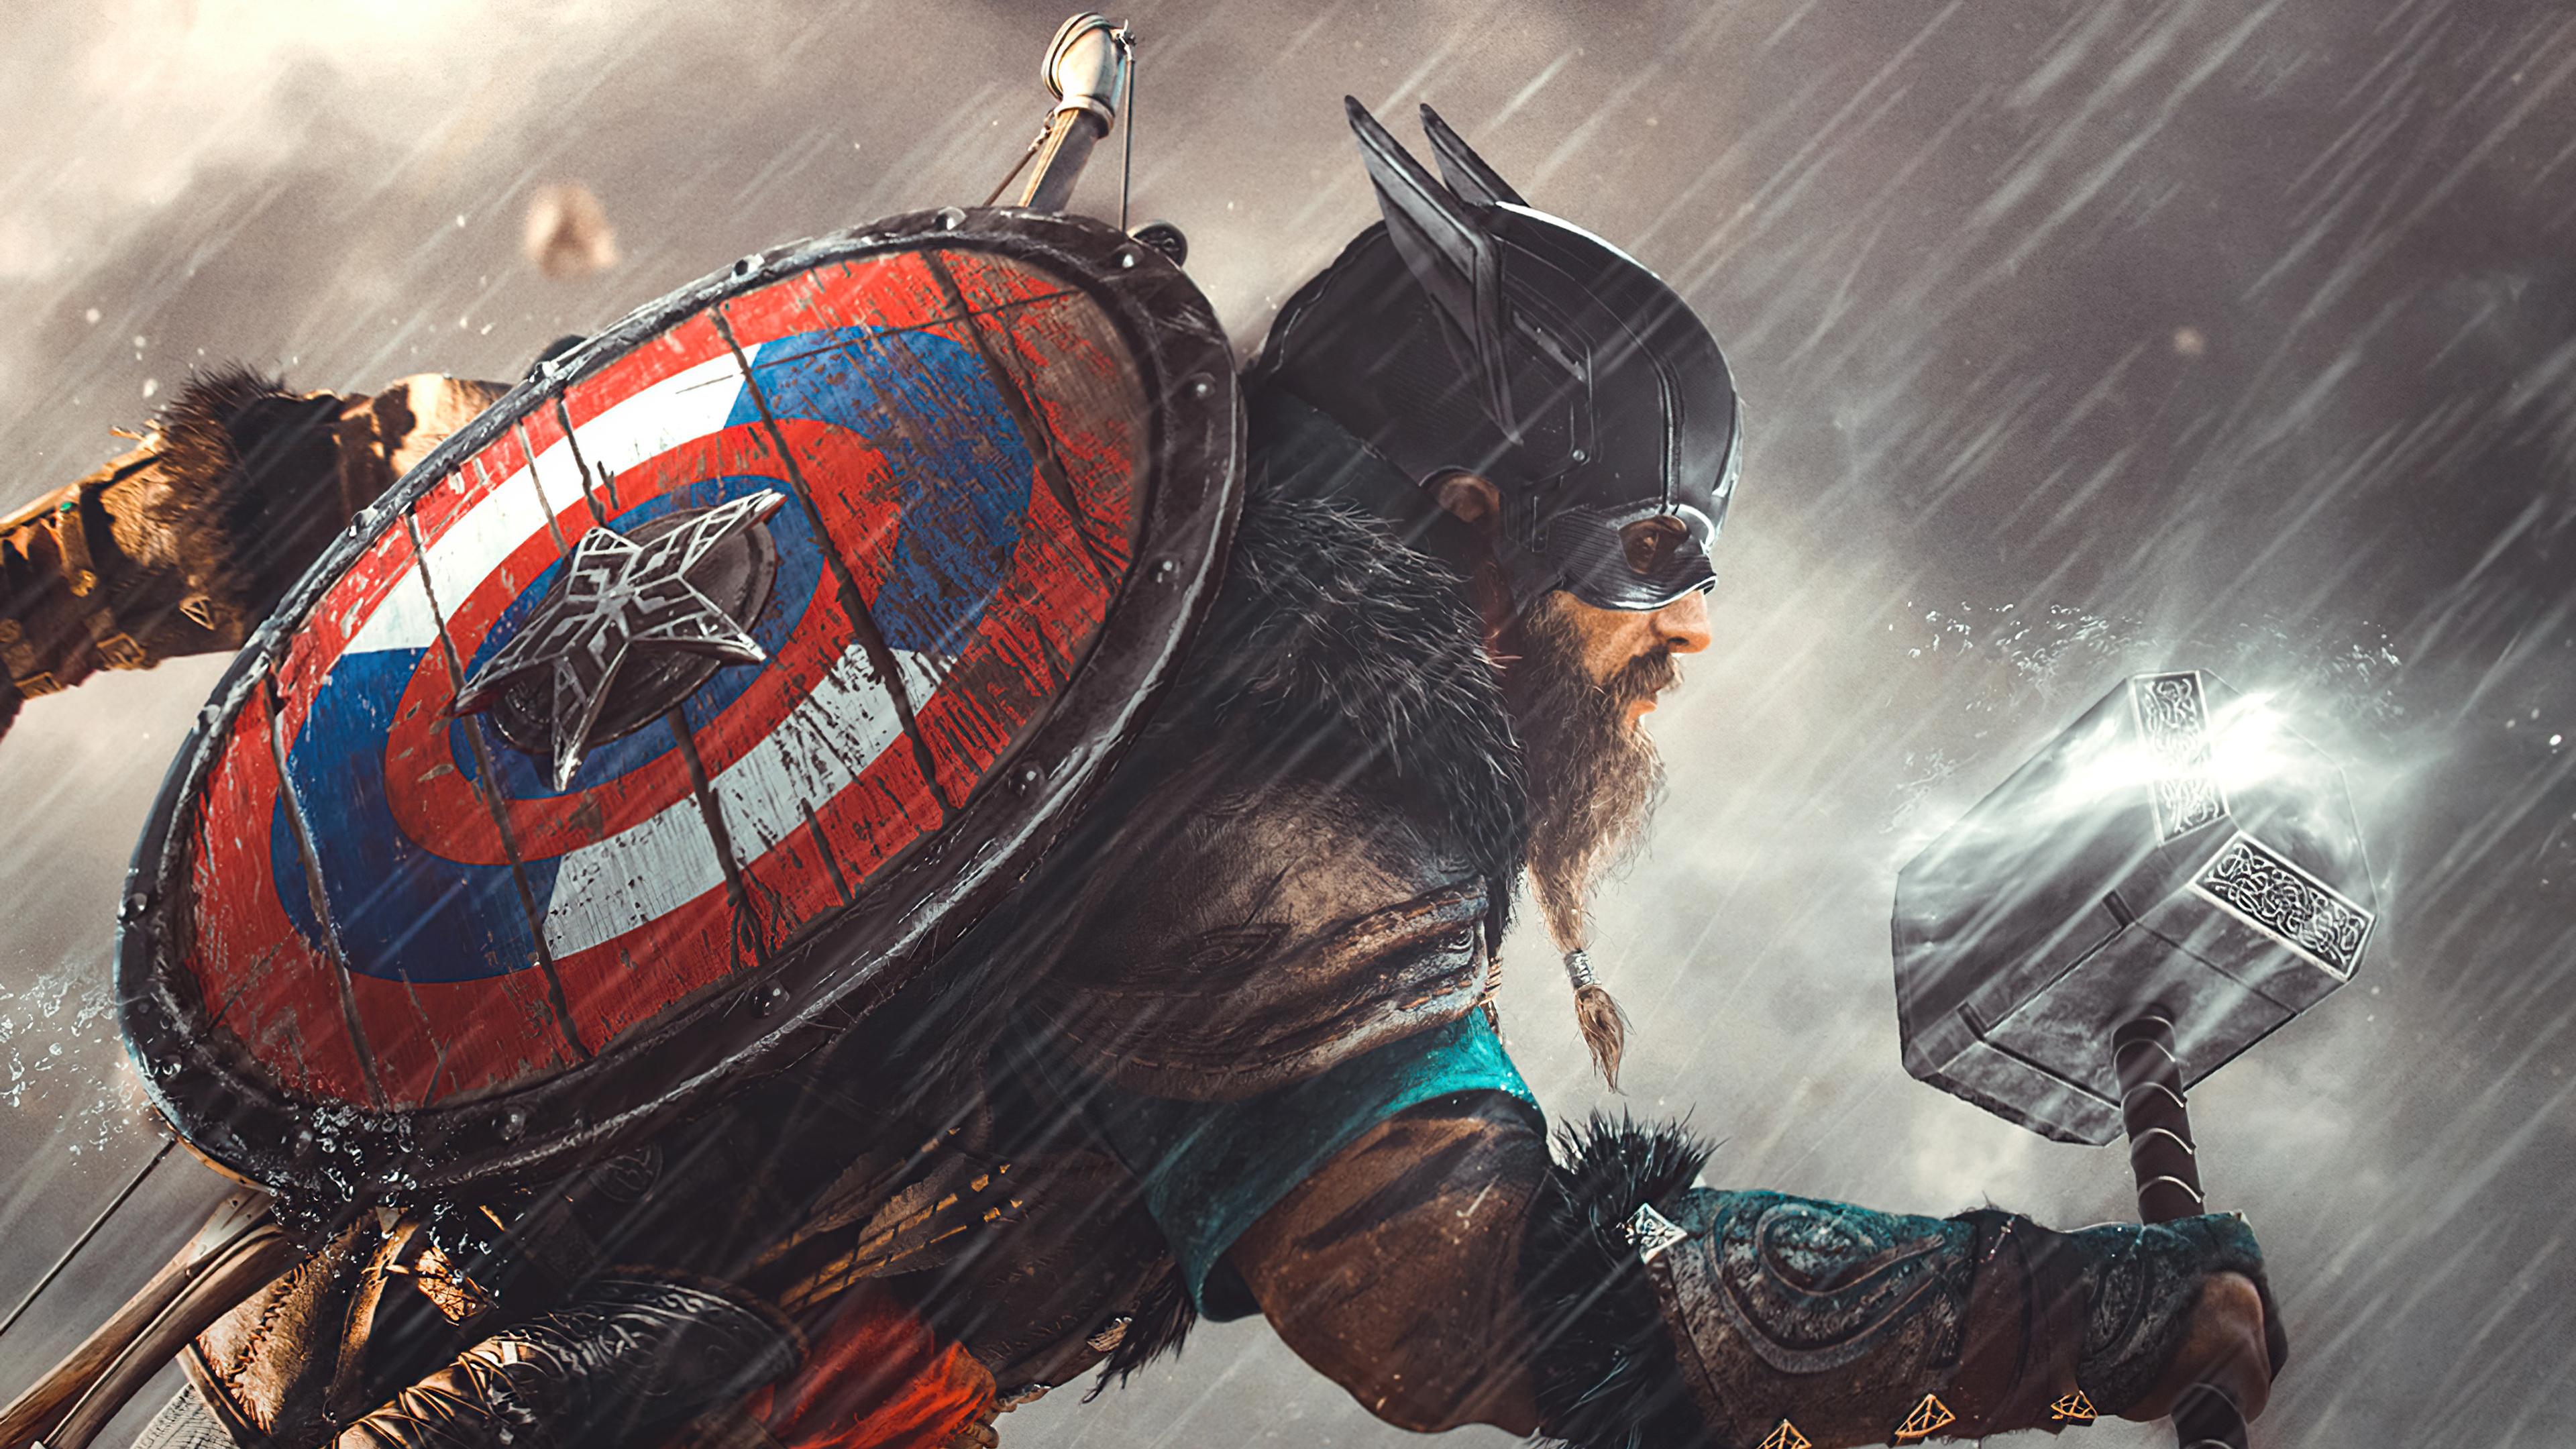 captain america valhalla 4k 1619216532 - Captain America Valhalla 4k - Captain America Valhalla 4k wallpapers